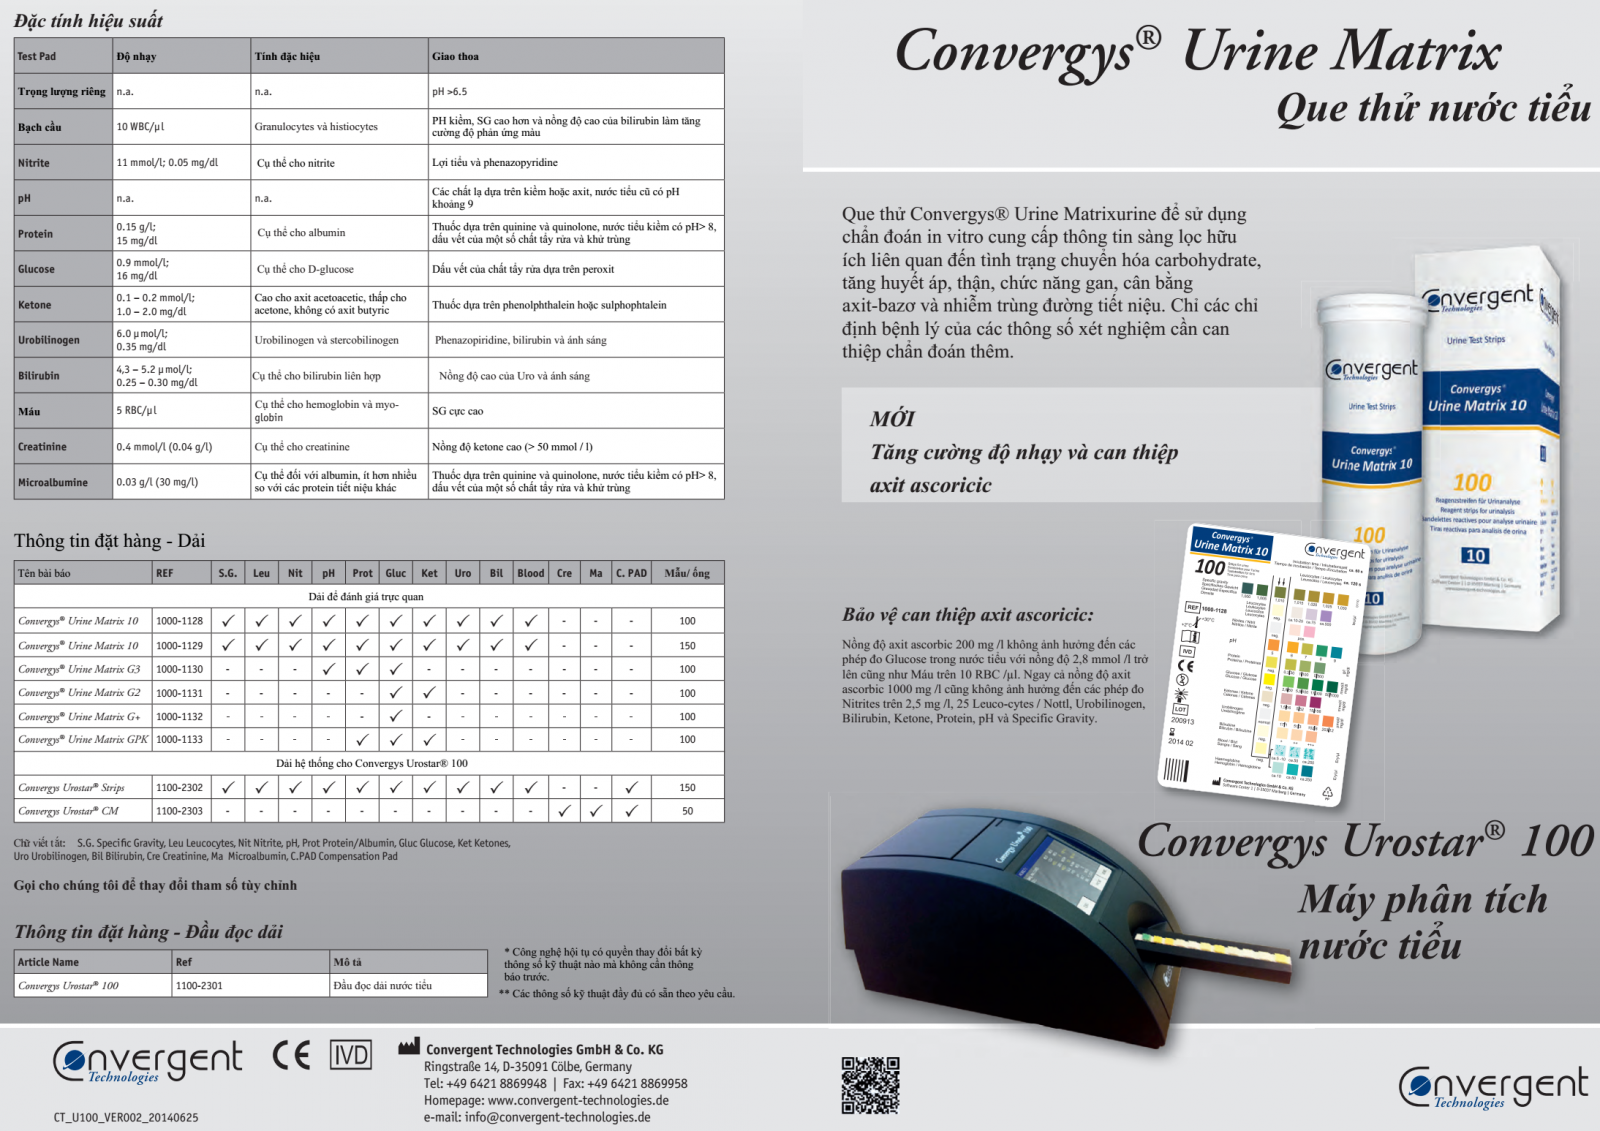 Máy nước tiểu Convergys® Urostar 100